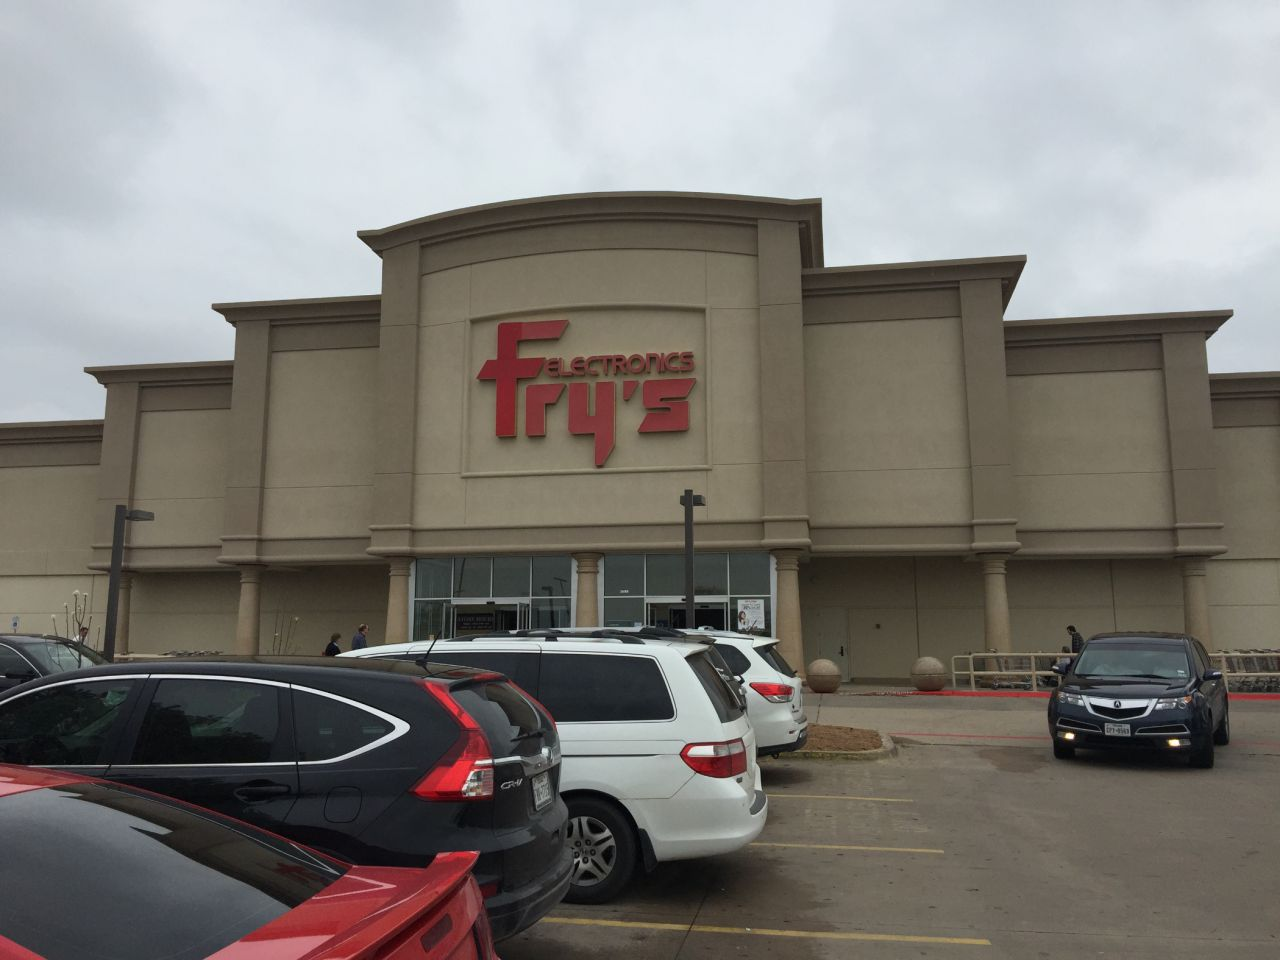 Fry's Electronics Irving, TX Daytime